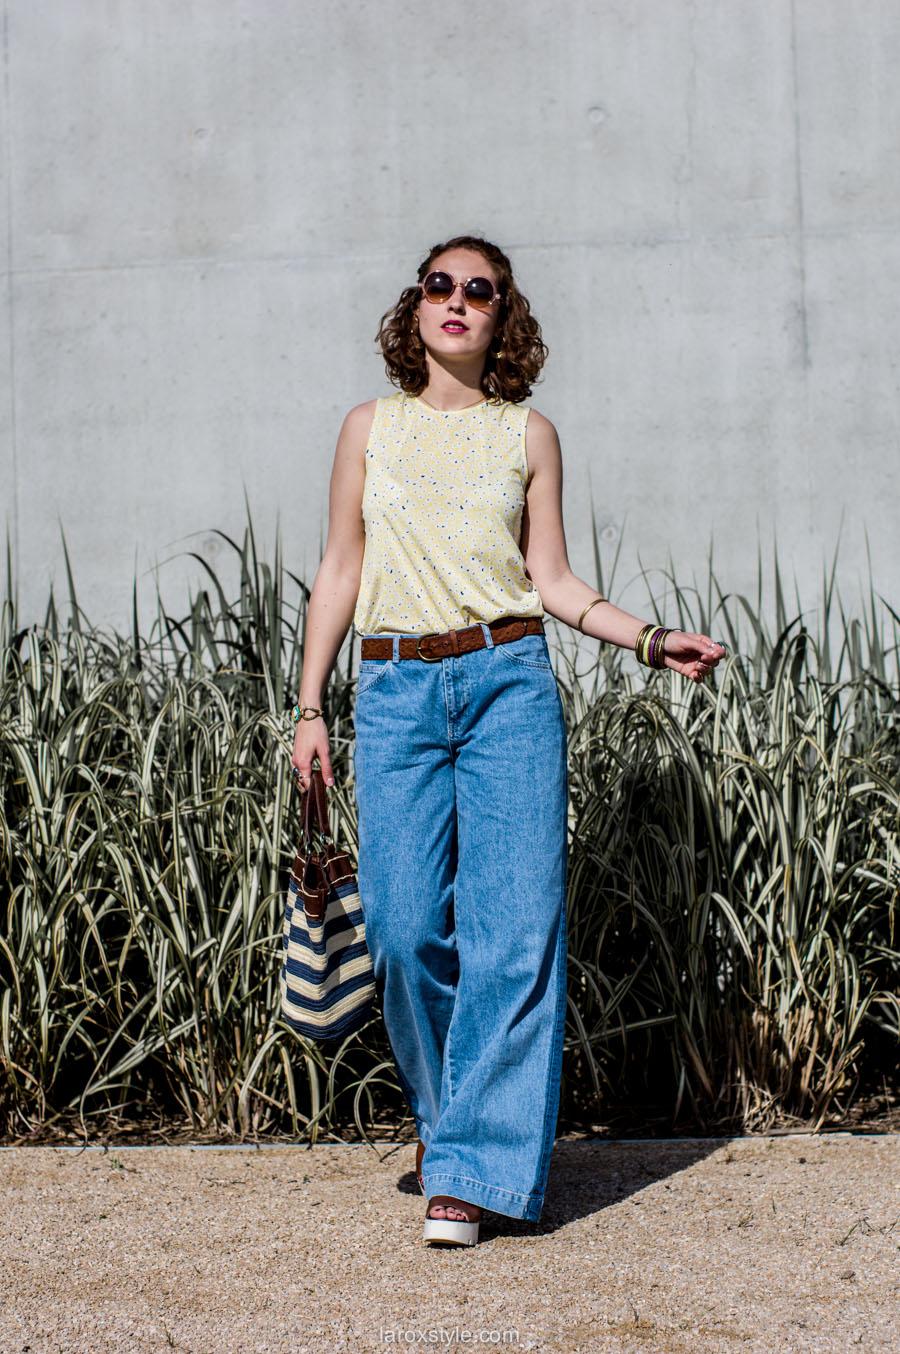 laroxstyle - blog mode lyon - look 70s - pantalon patte d elephant (21 sur 44)